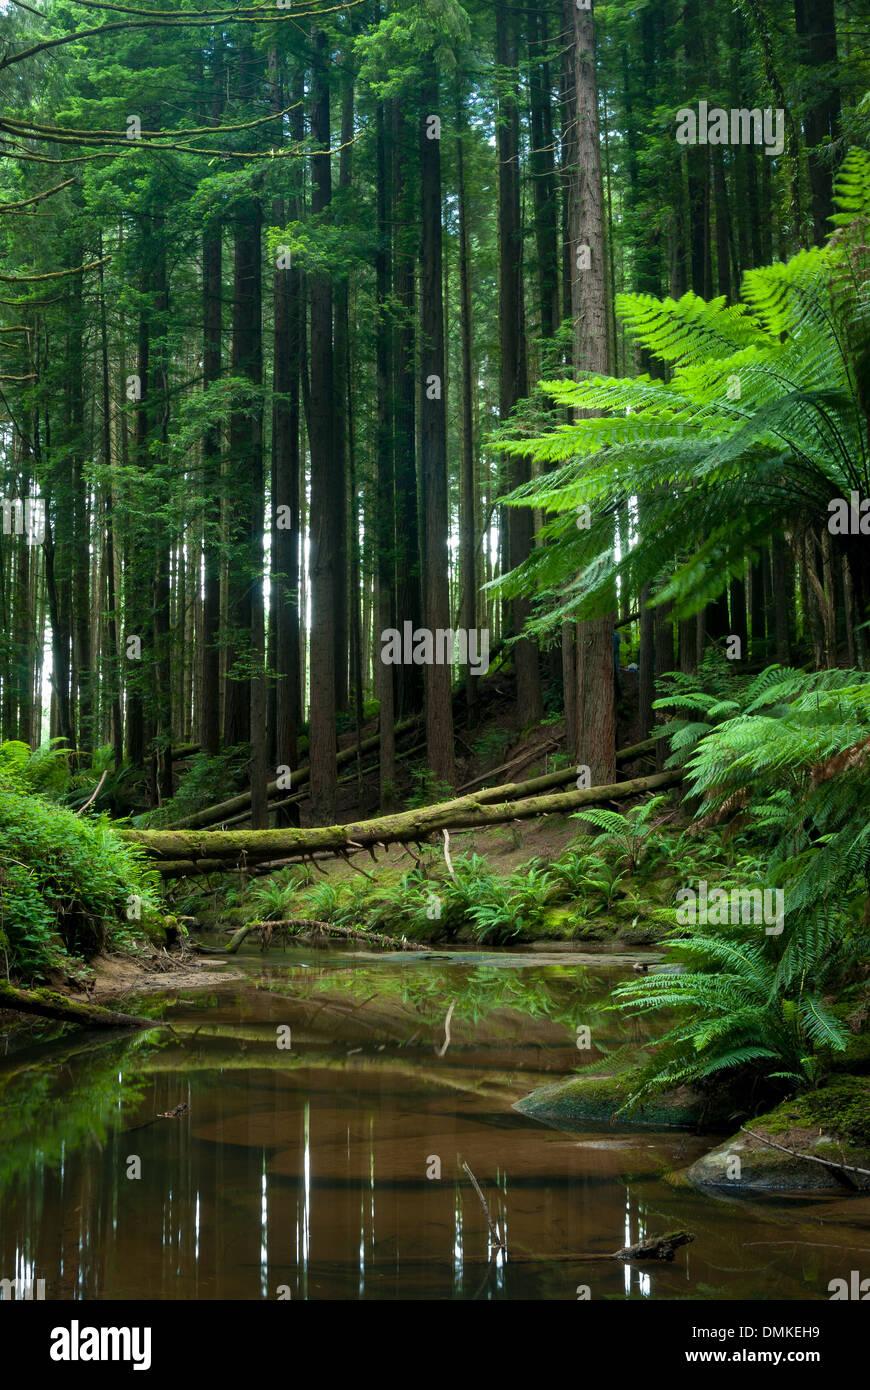 Otways forest - Stock Image